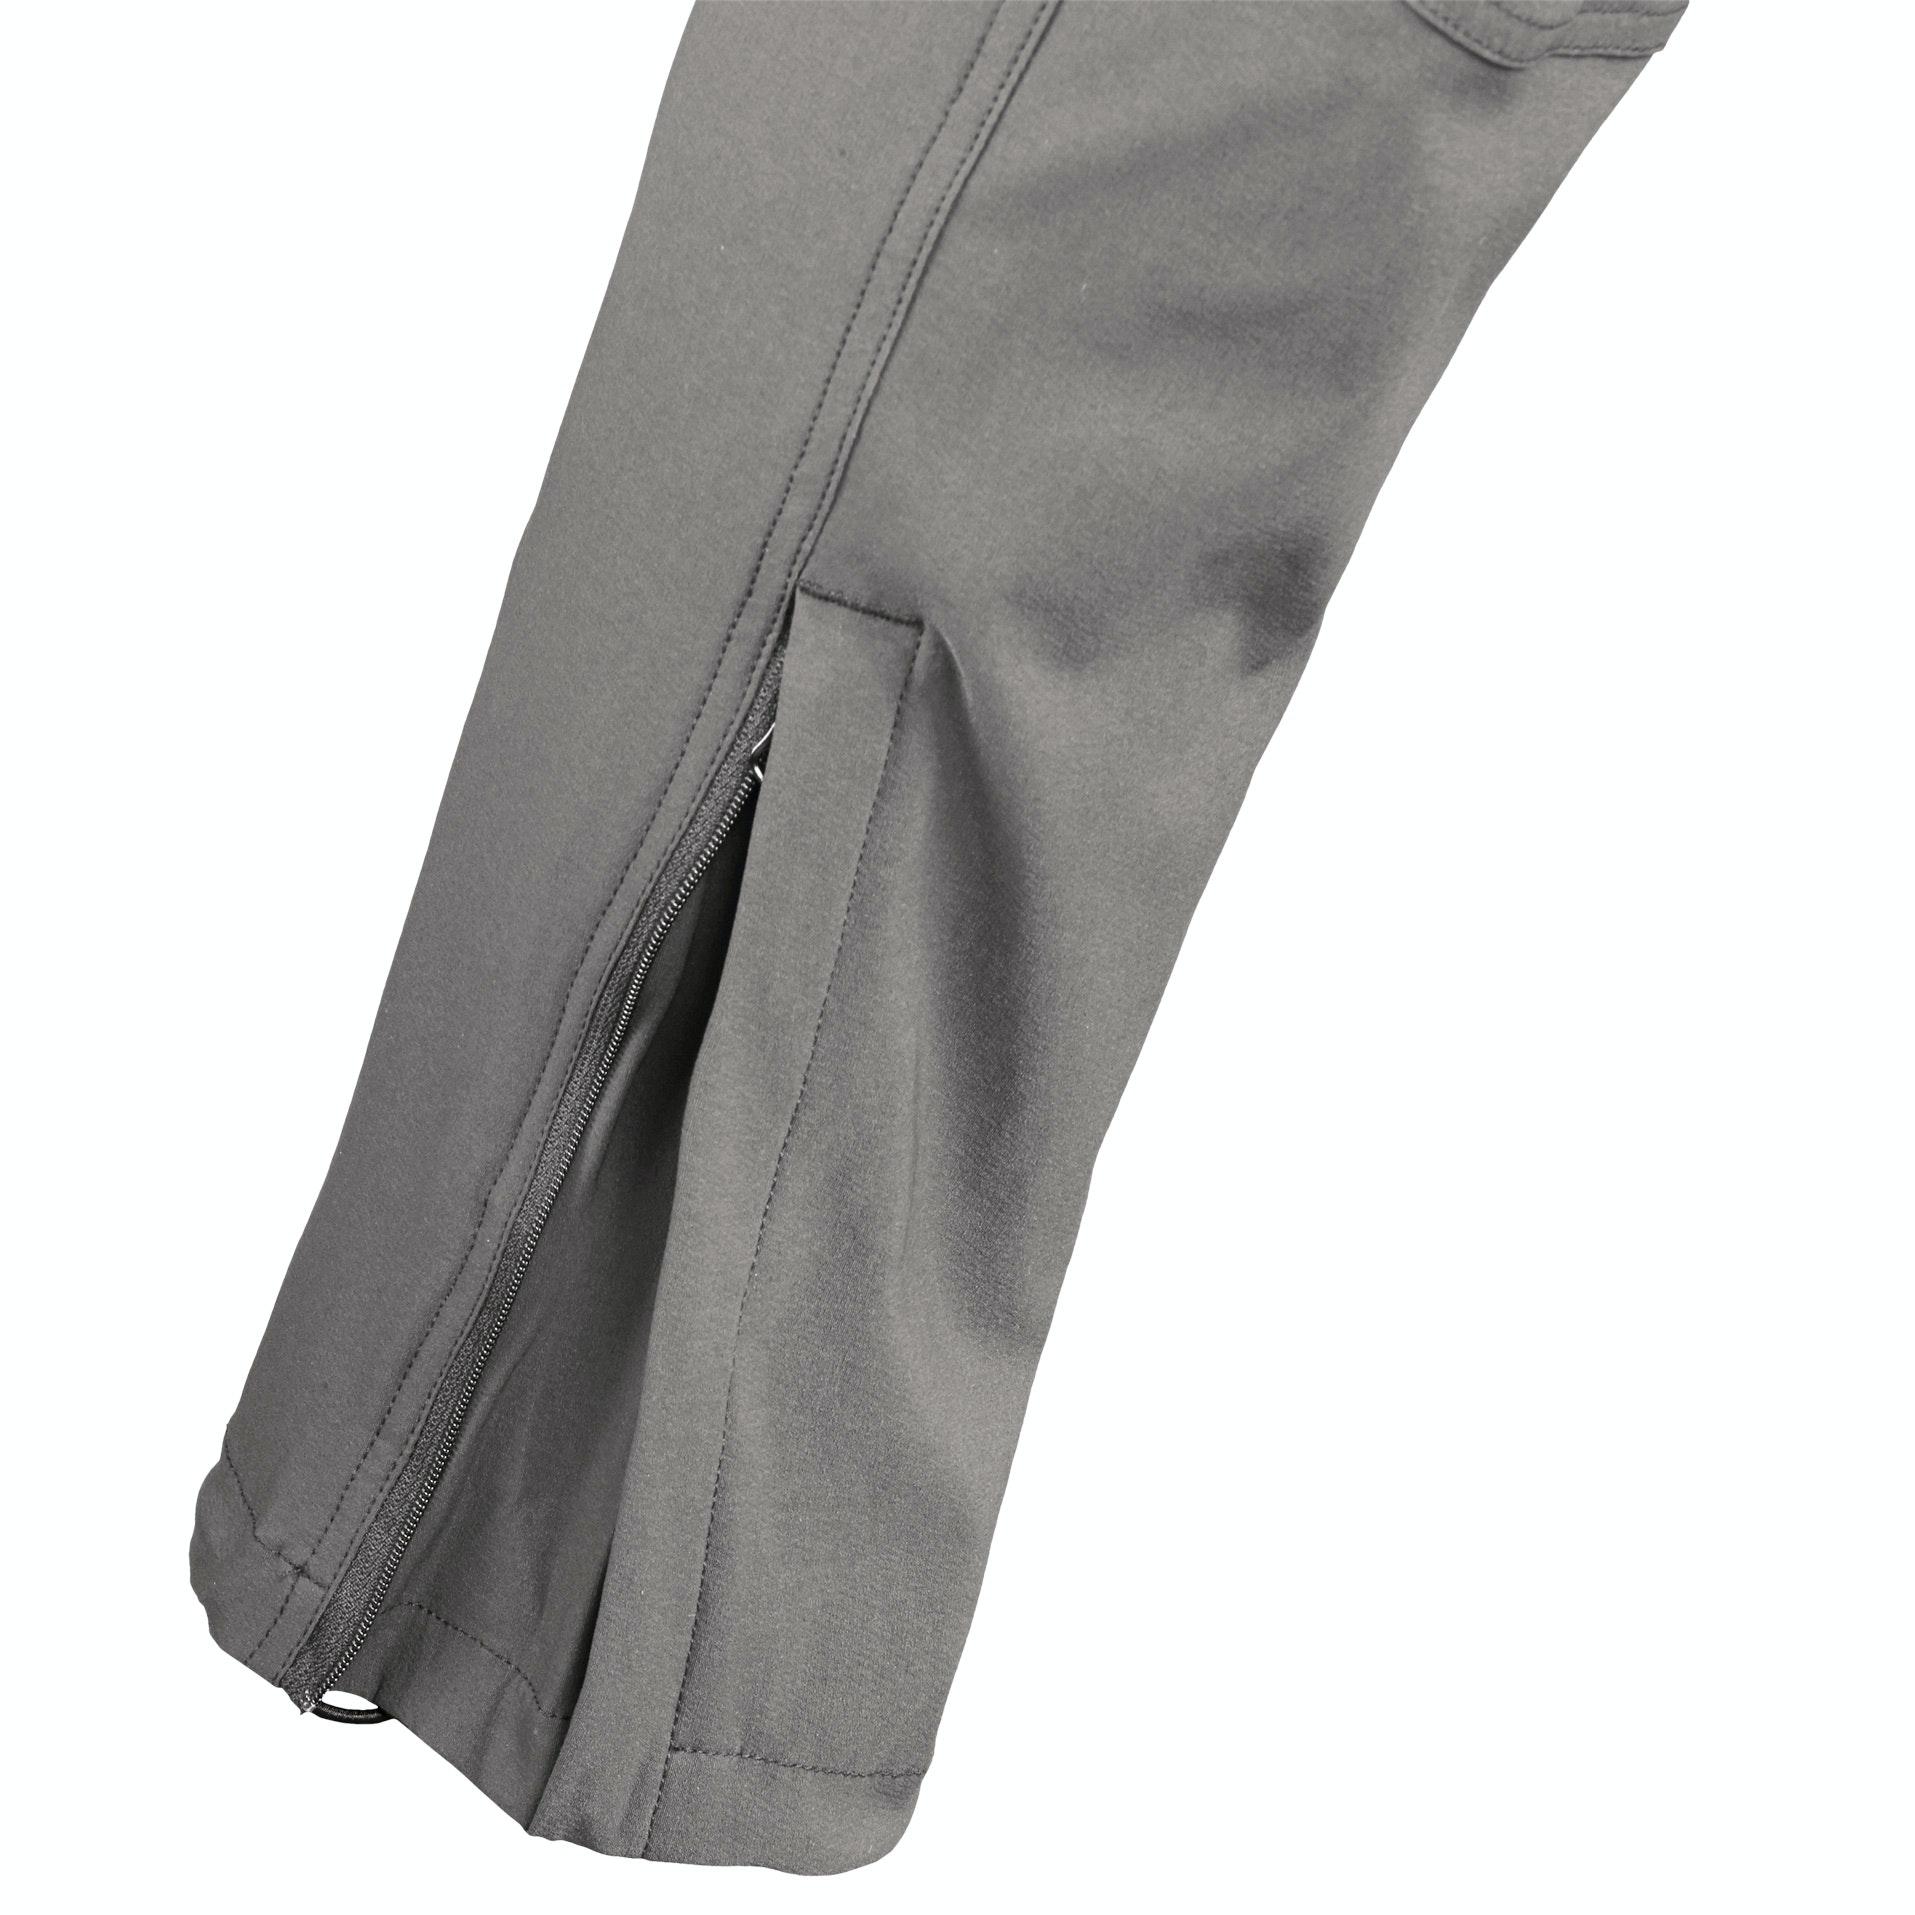 NEW-Kathmandu-Eris-Women-039-s-Softshell-Hiking-Pants-Trousers-v2-Zip-Hem-Over-Boots thumbnail 14